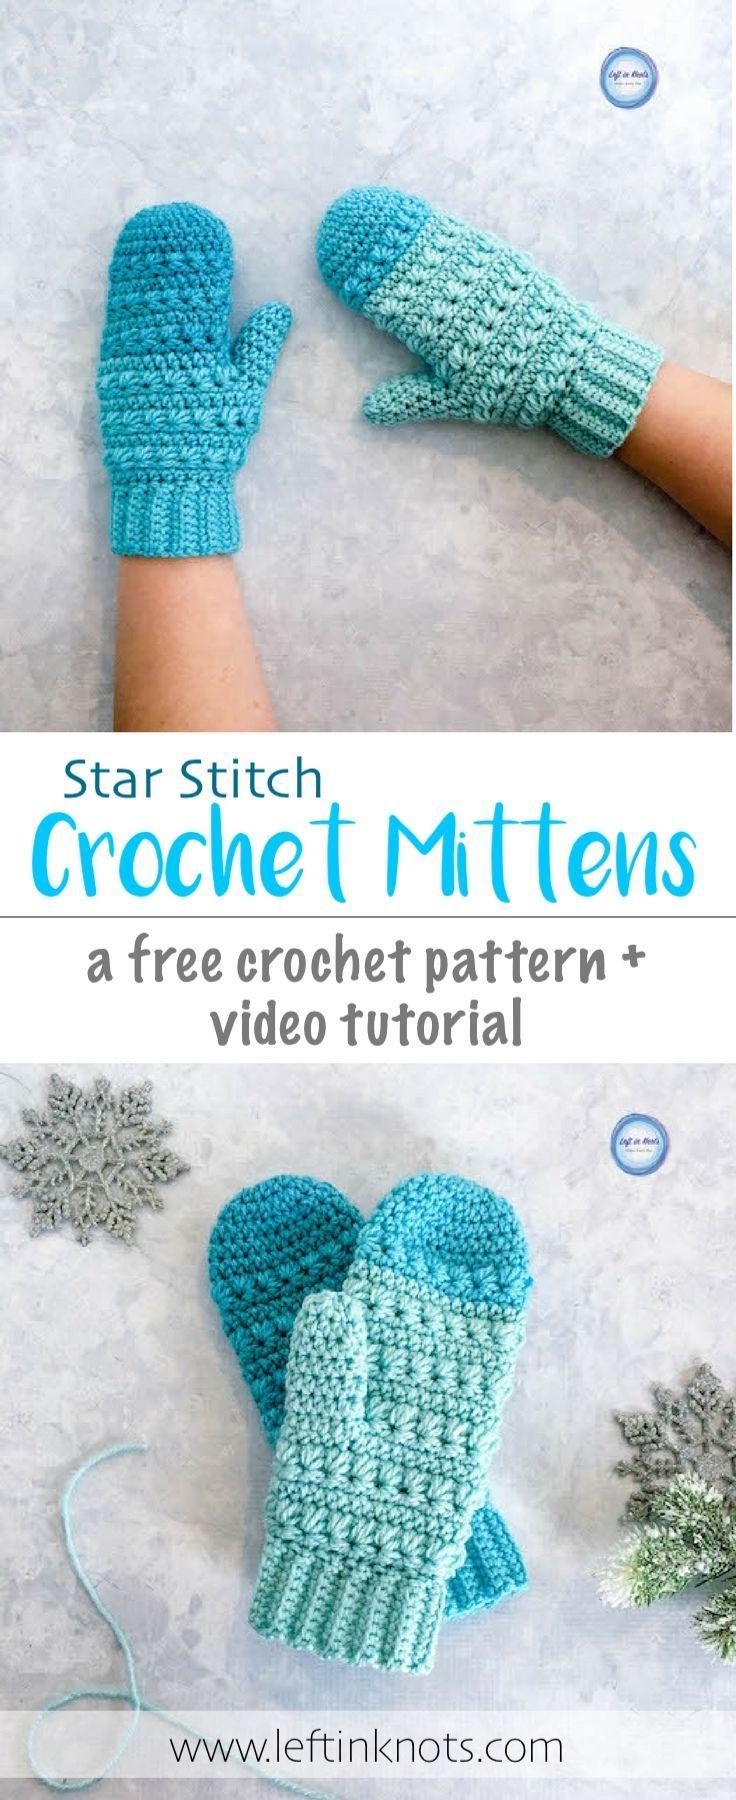 Snow Drops Mittens Free Crochet Pattern Handwarmerleg Cuffs Ear